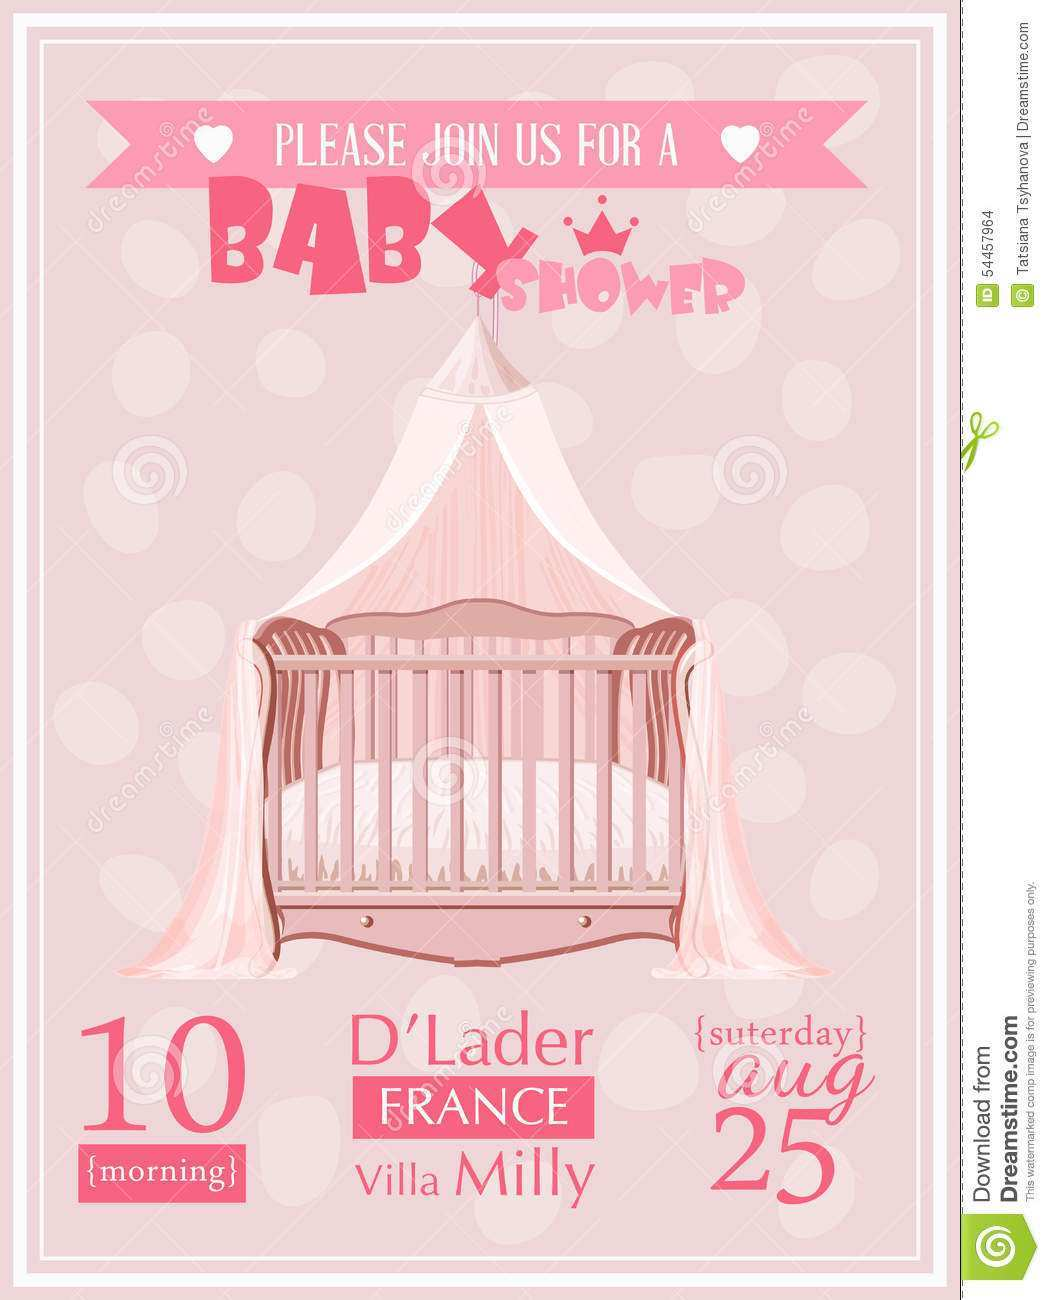 69 Create Baby Shower Invitation Template Vector in Word for Baby Shower Invitation Template Vector